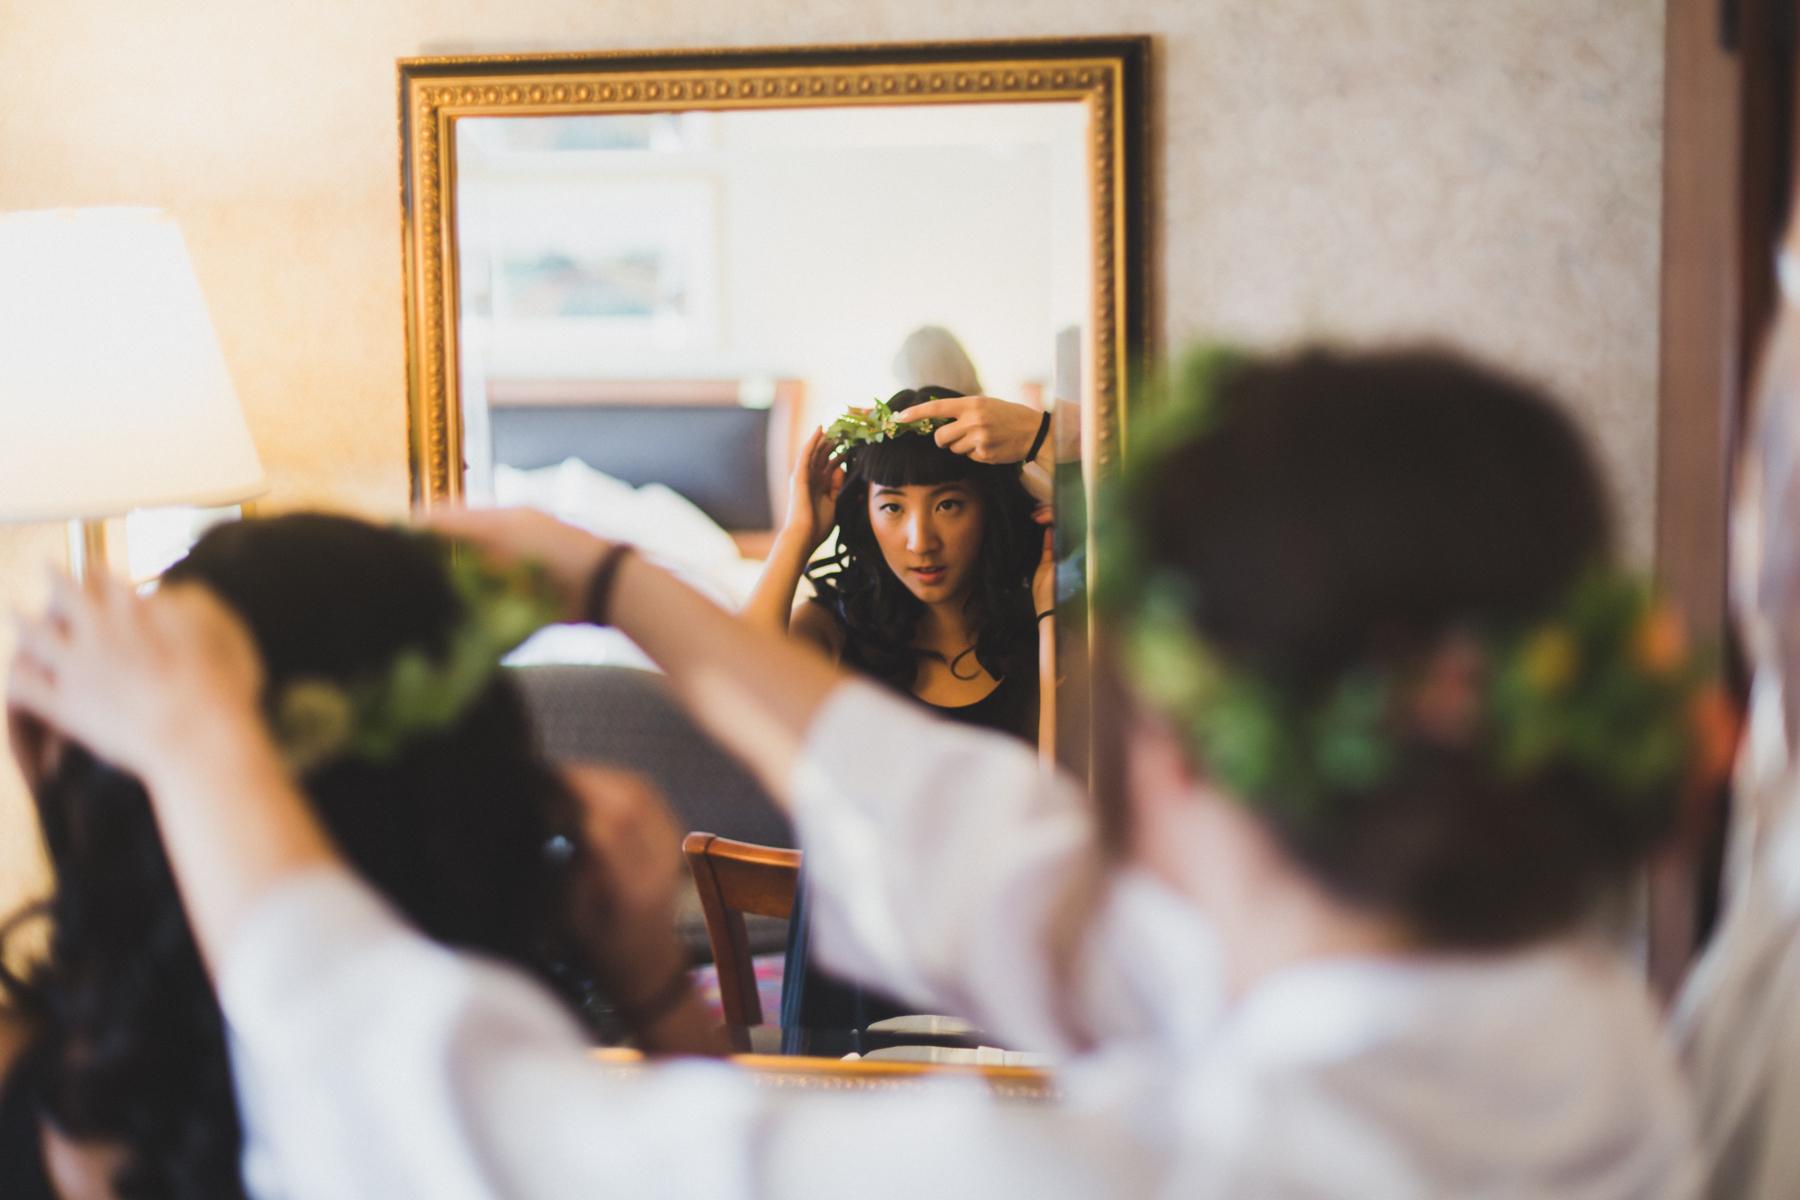 Long-Island-Documentary-Wedding-Photography-Summer-Tent-Wedding-in-New-York-1.jpg